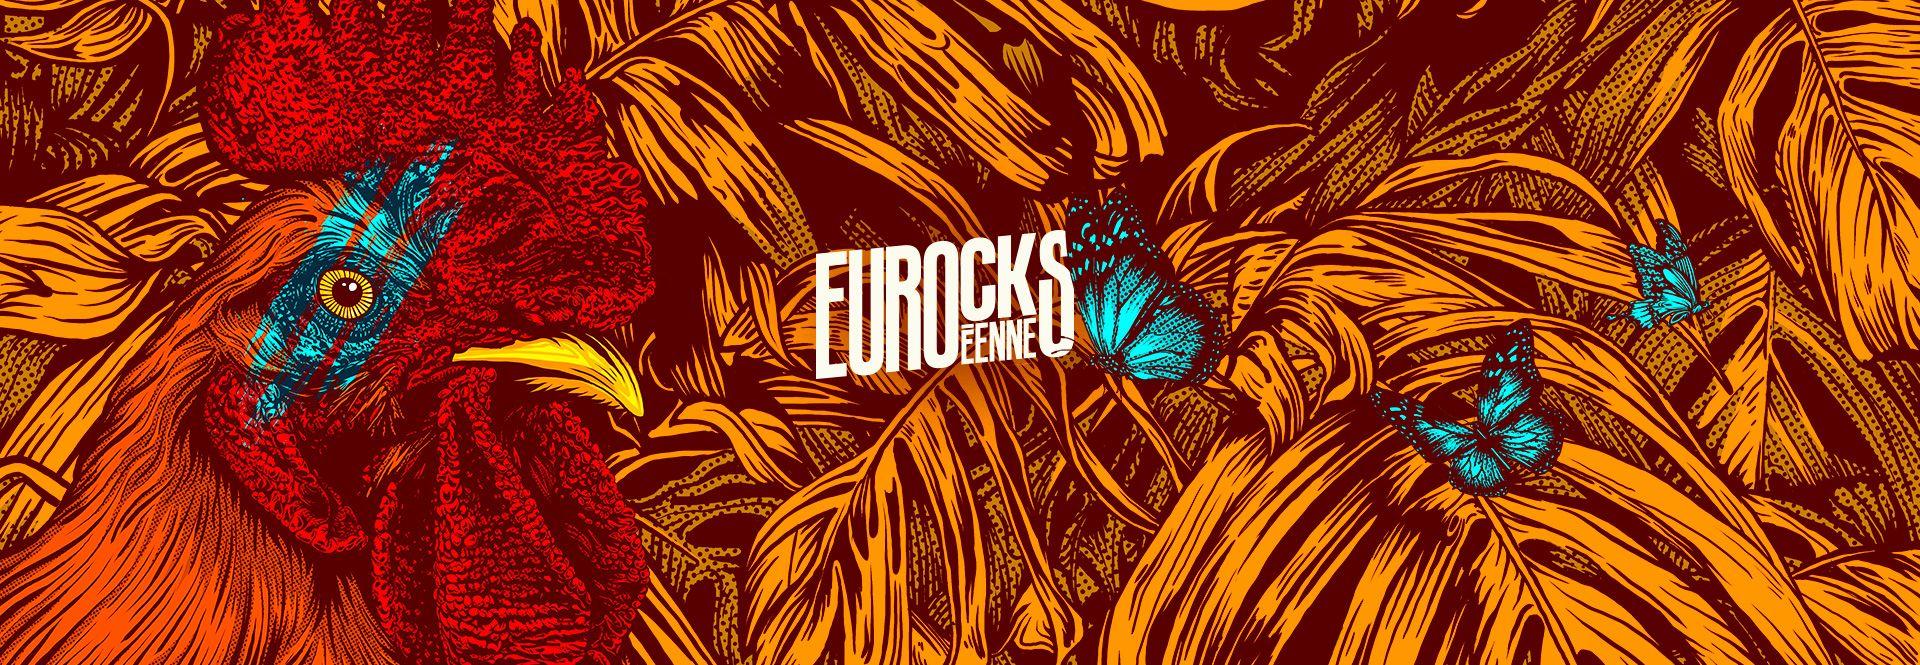 Les Eurockéennes